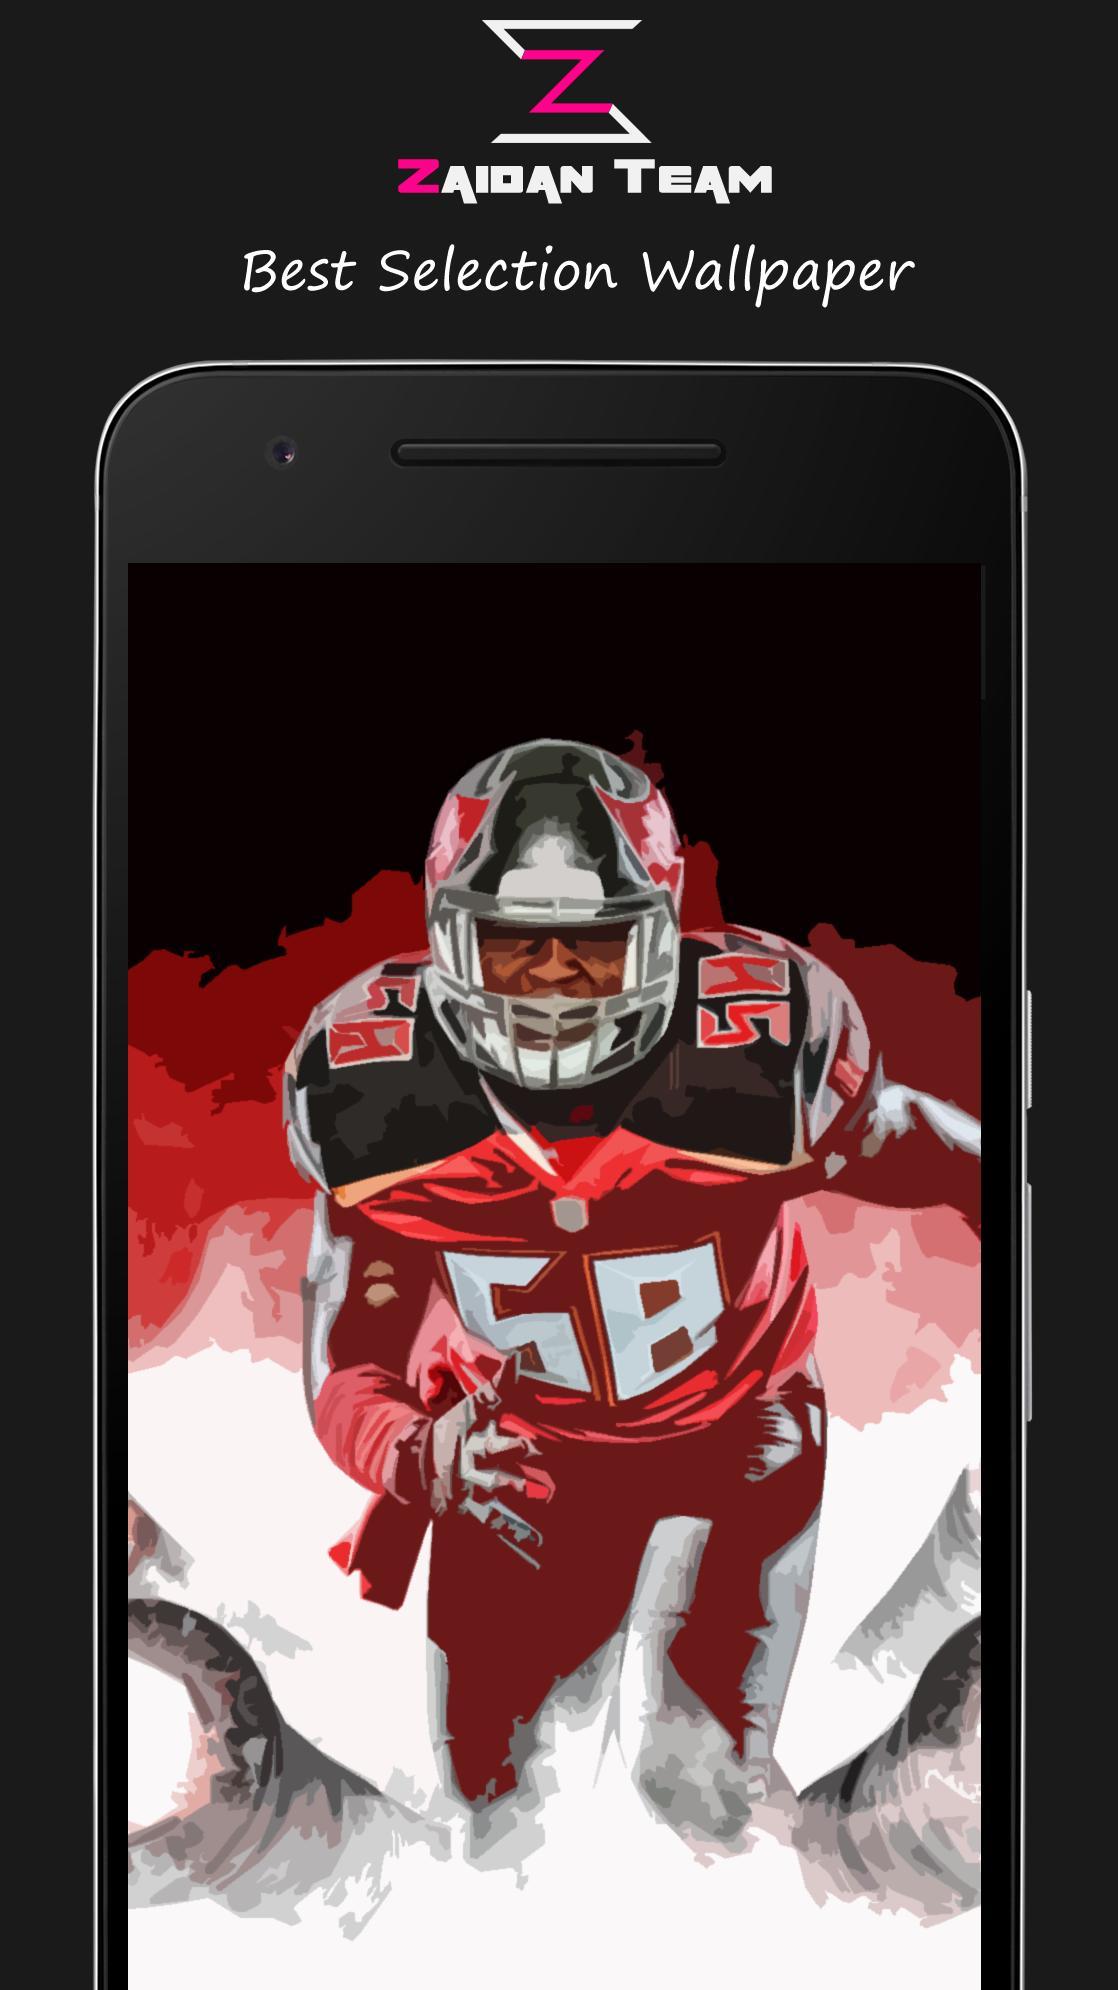 New Tampa Bay Buccaneers Wallpaper Hd Zaidan For Android Apk Download